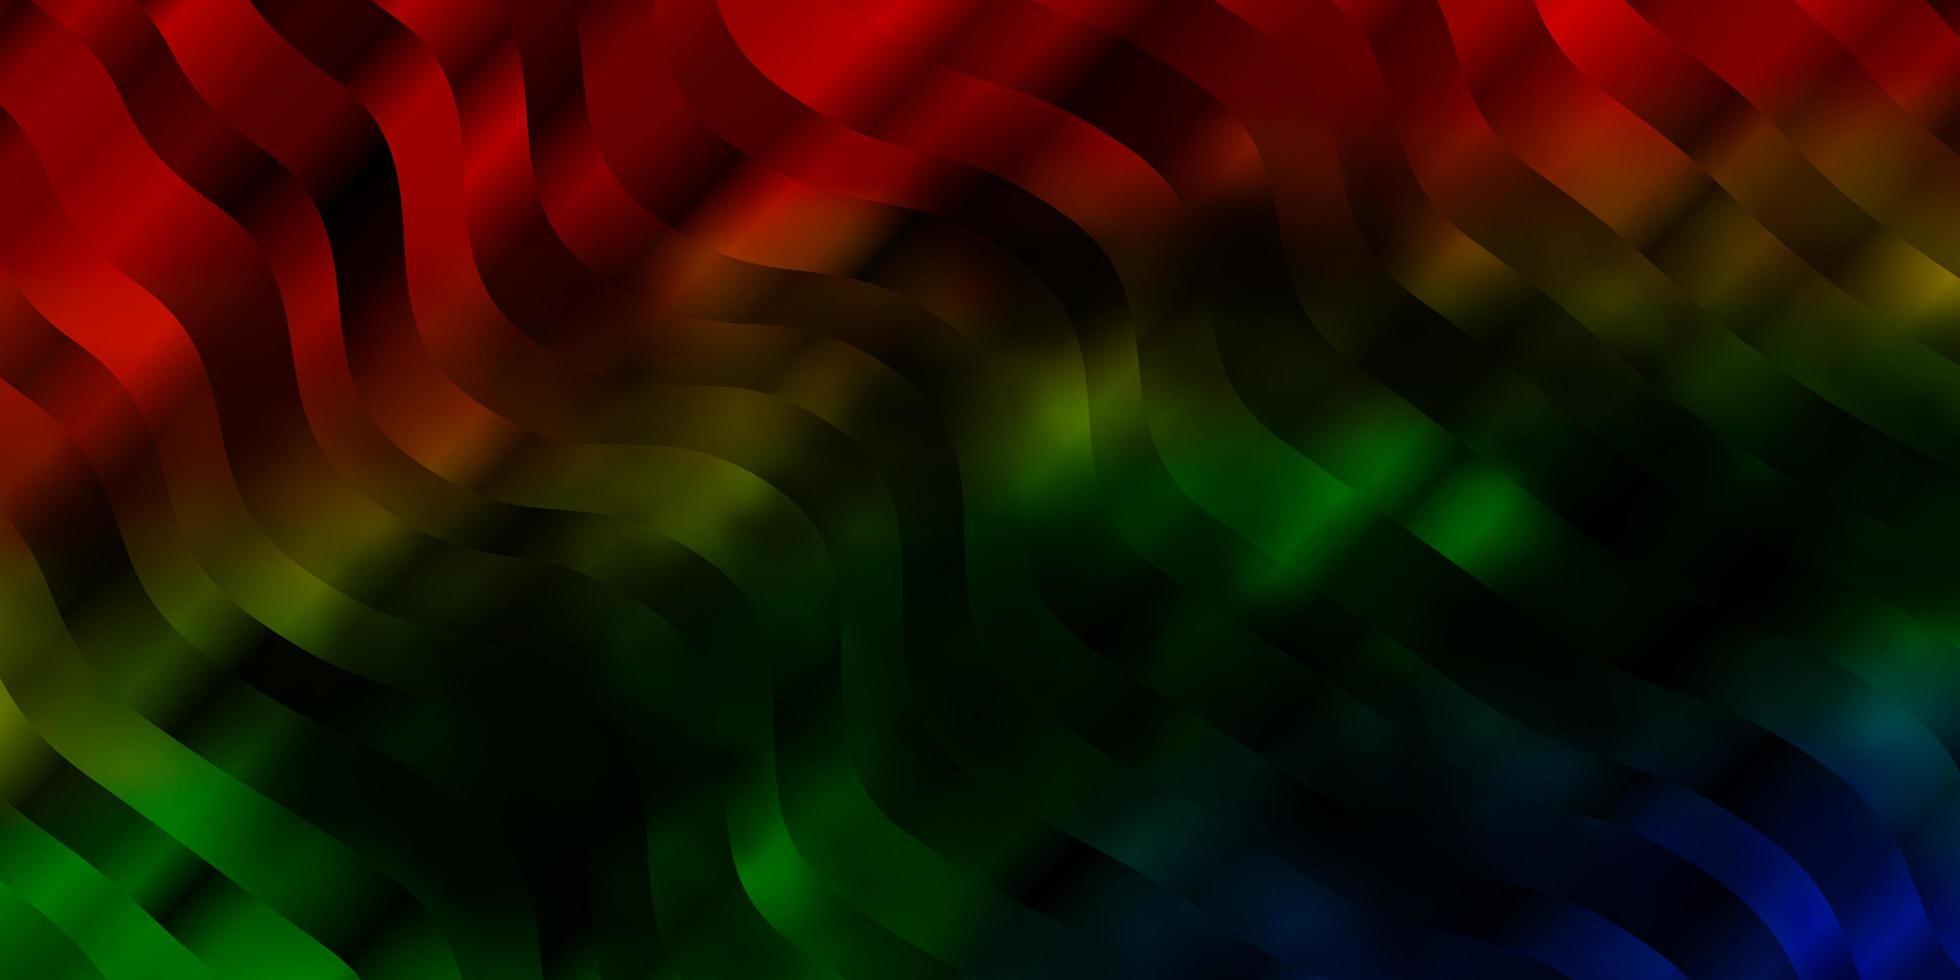 pano de fundo escuro do vetor multicolor com curvas.